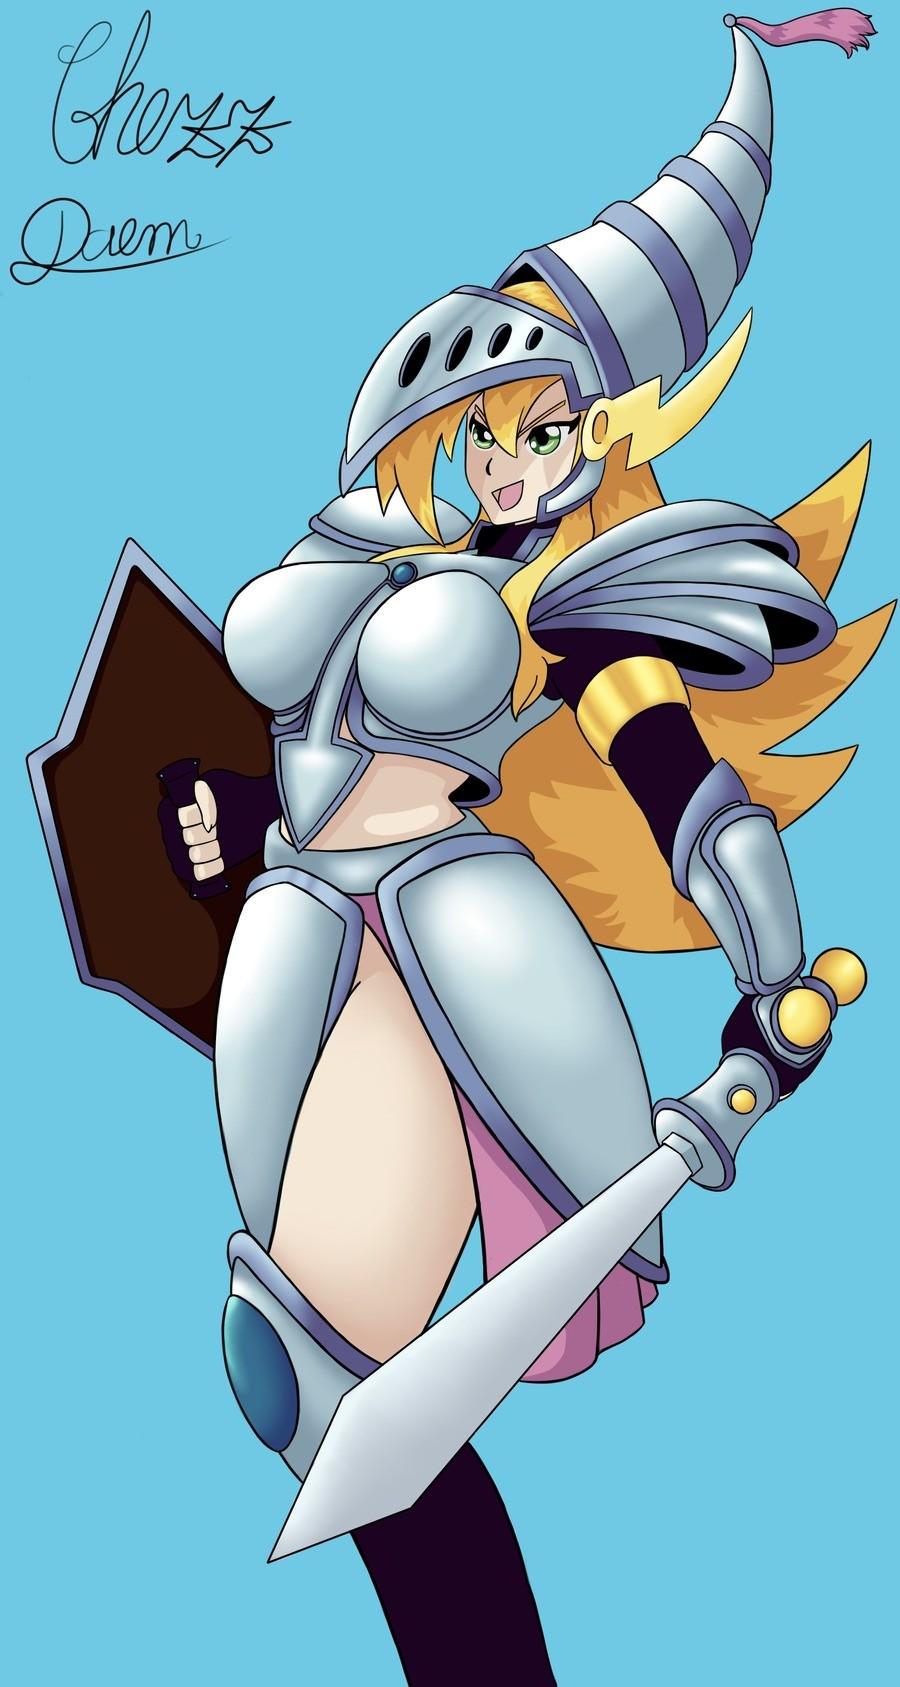 Dark Magician Girl, Dragon Kht. .. Where's her other leg?